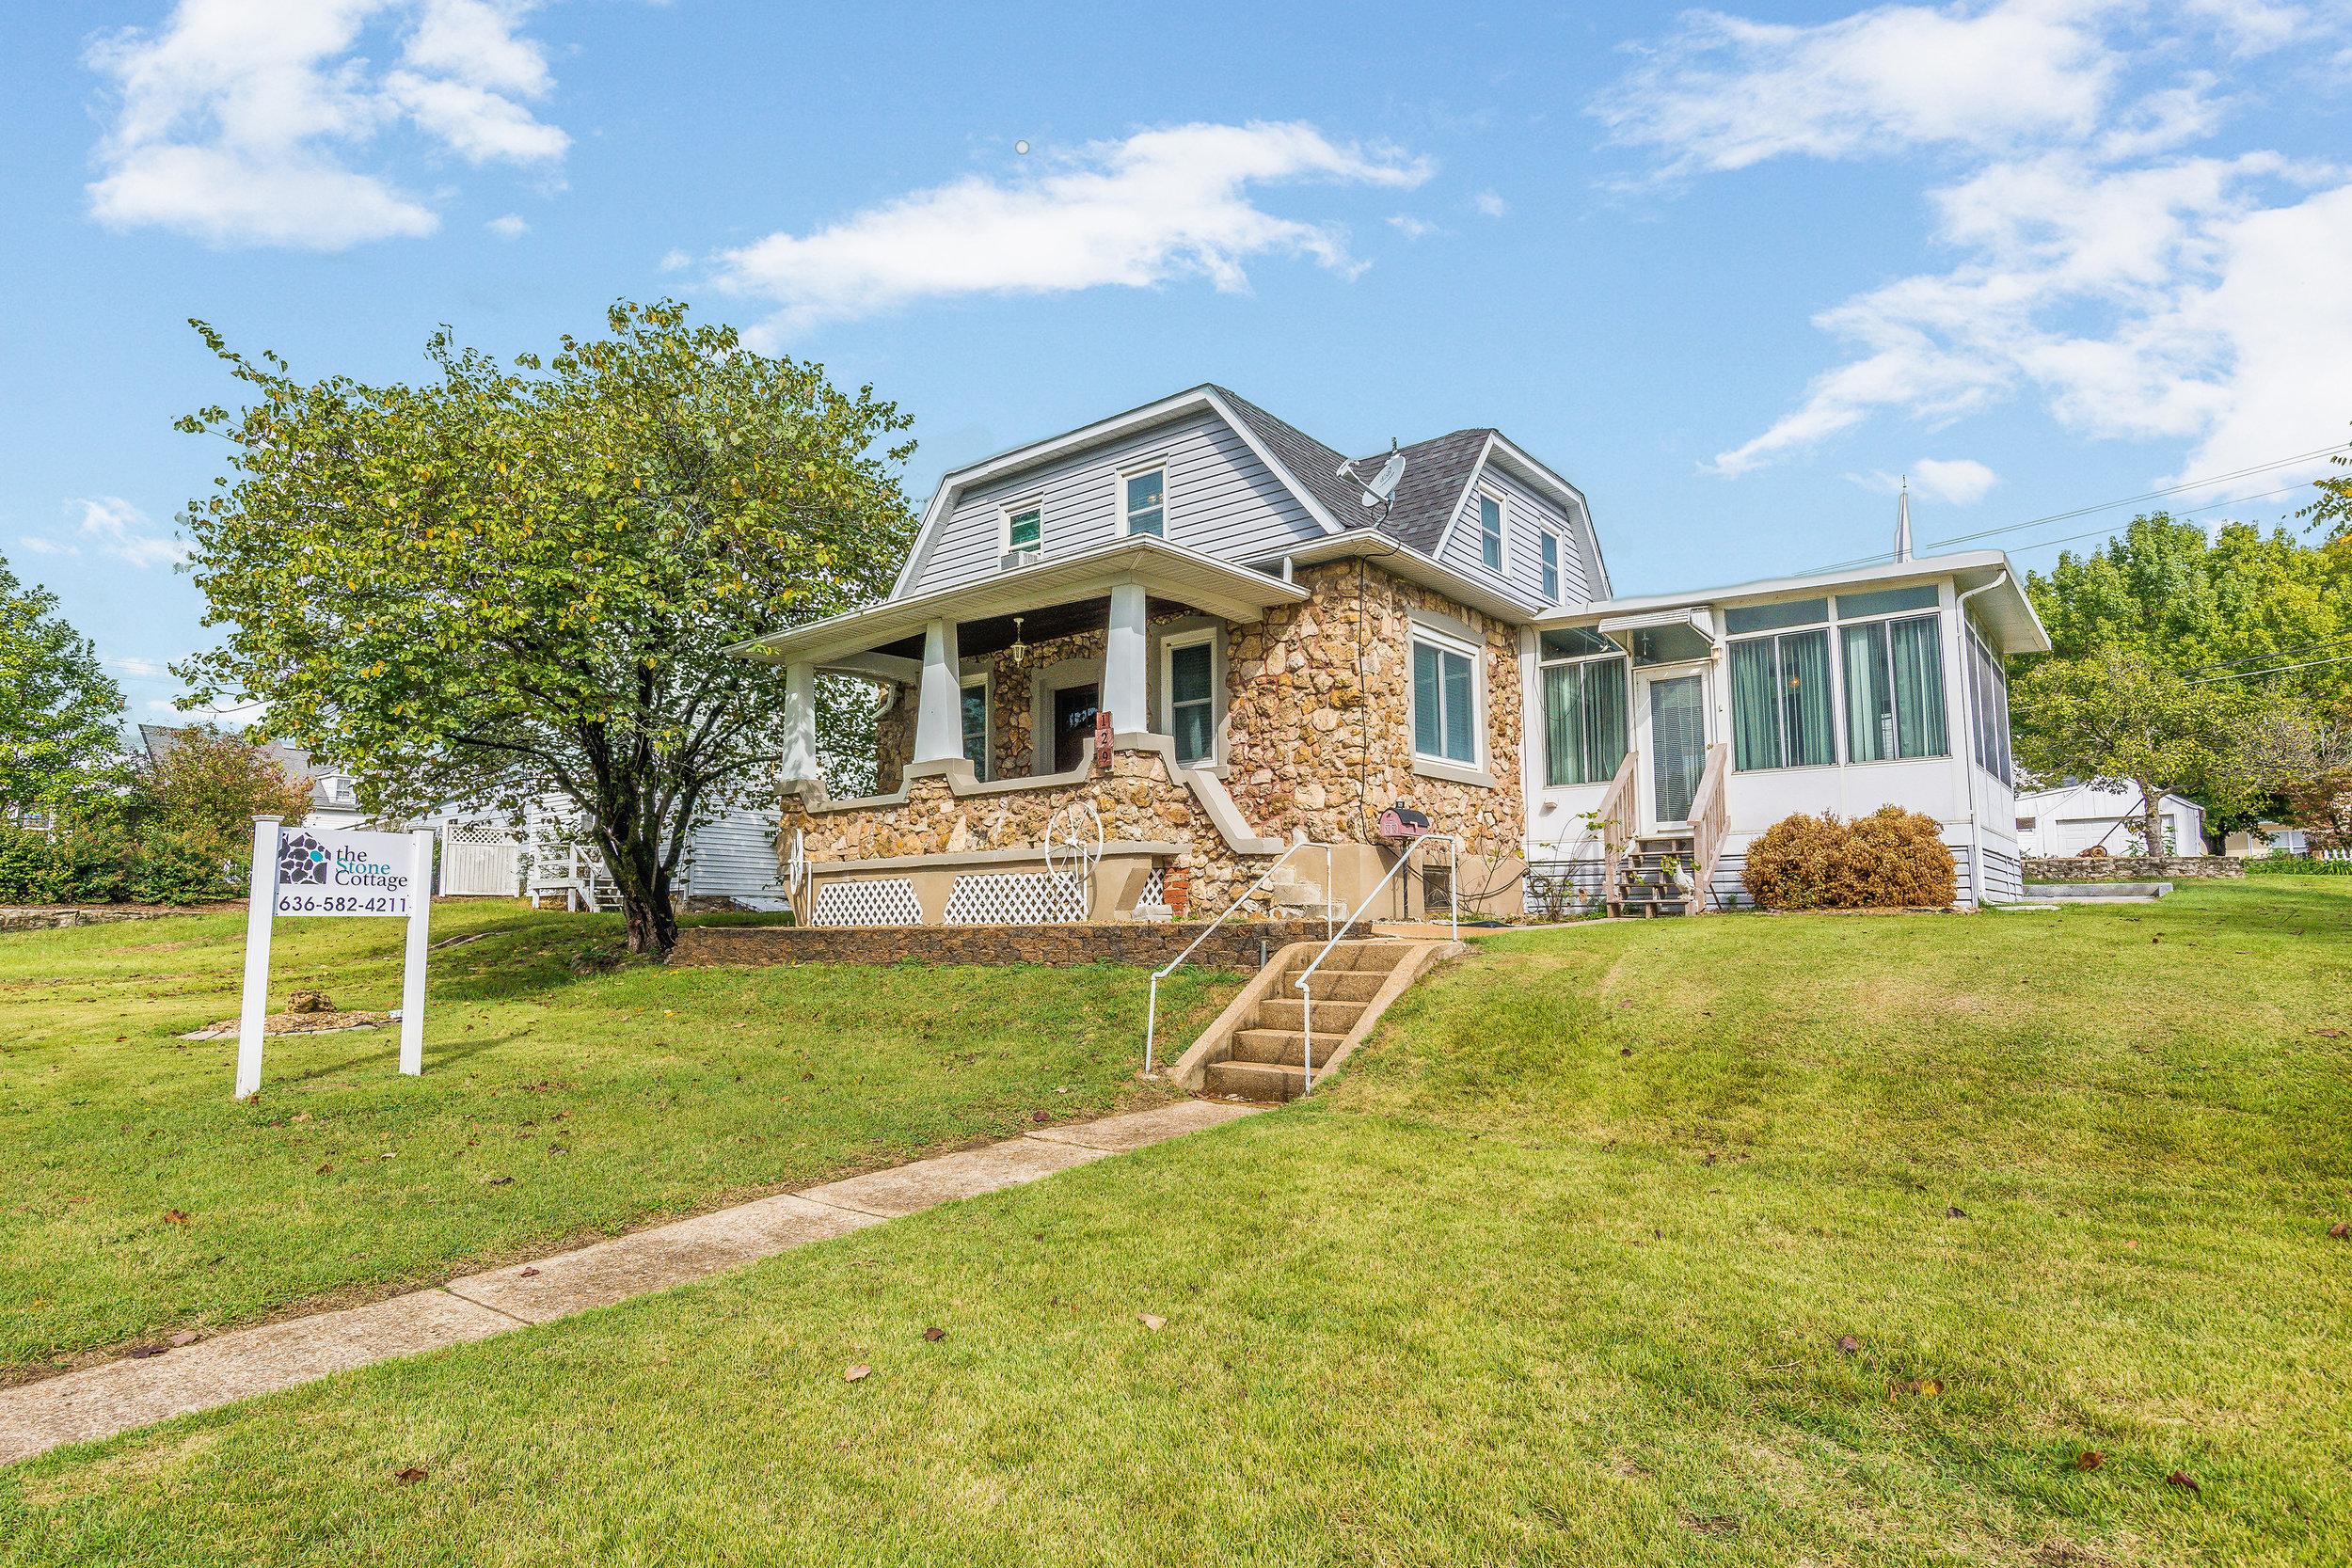 Stone-Cottage-Hermann-Missouri-vacation-rental-01-1002.jpg